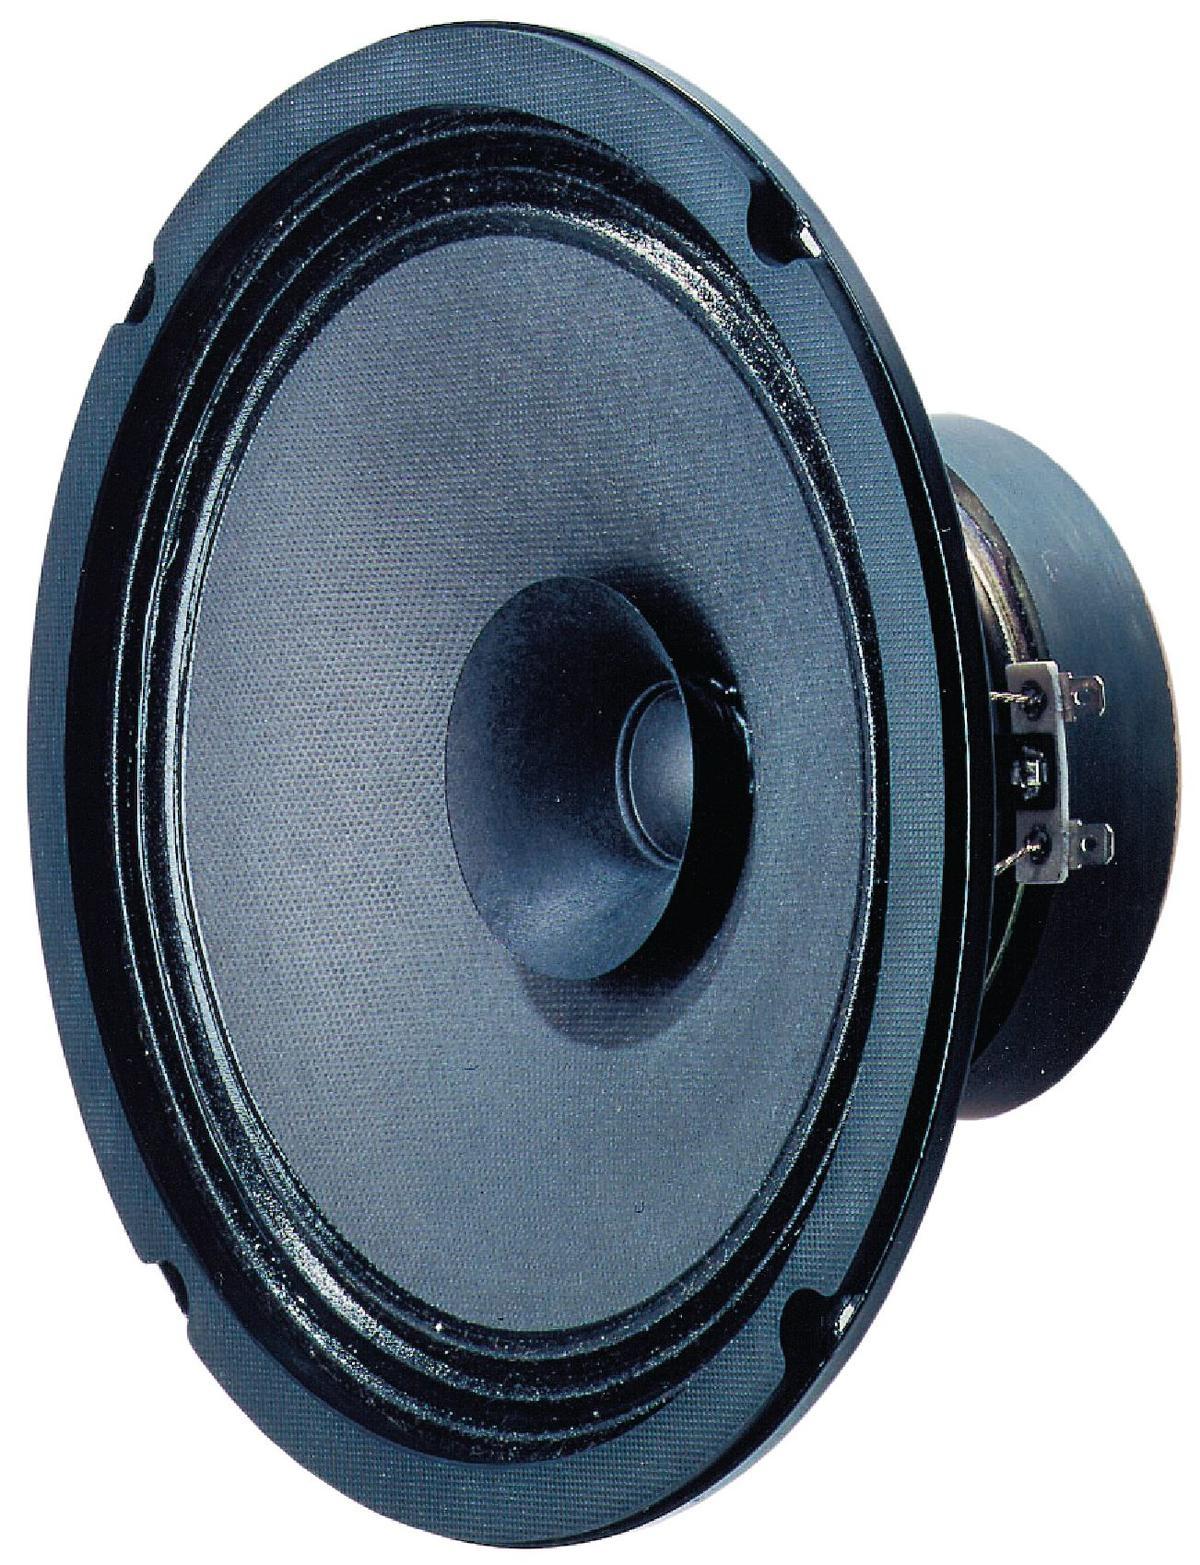 full range luidspreker 20 cm 8 8 ohm vs bg20 rutten. Black Bedroom Furniture Sets. Home Design Ideas